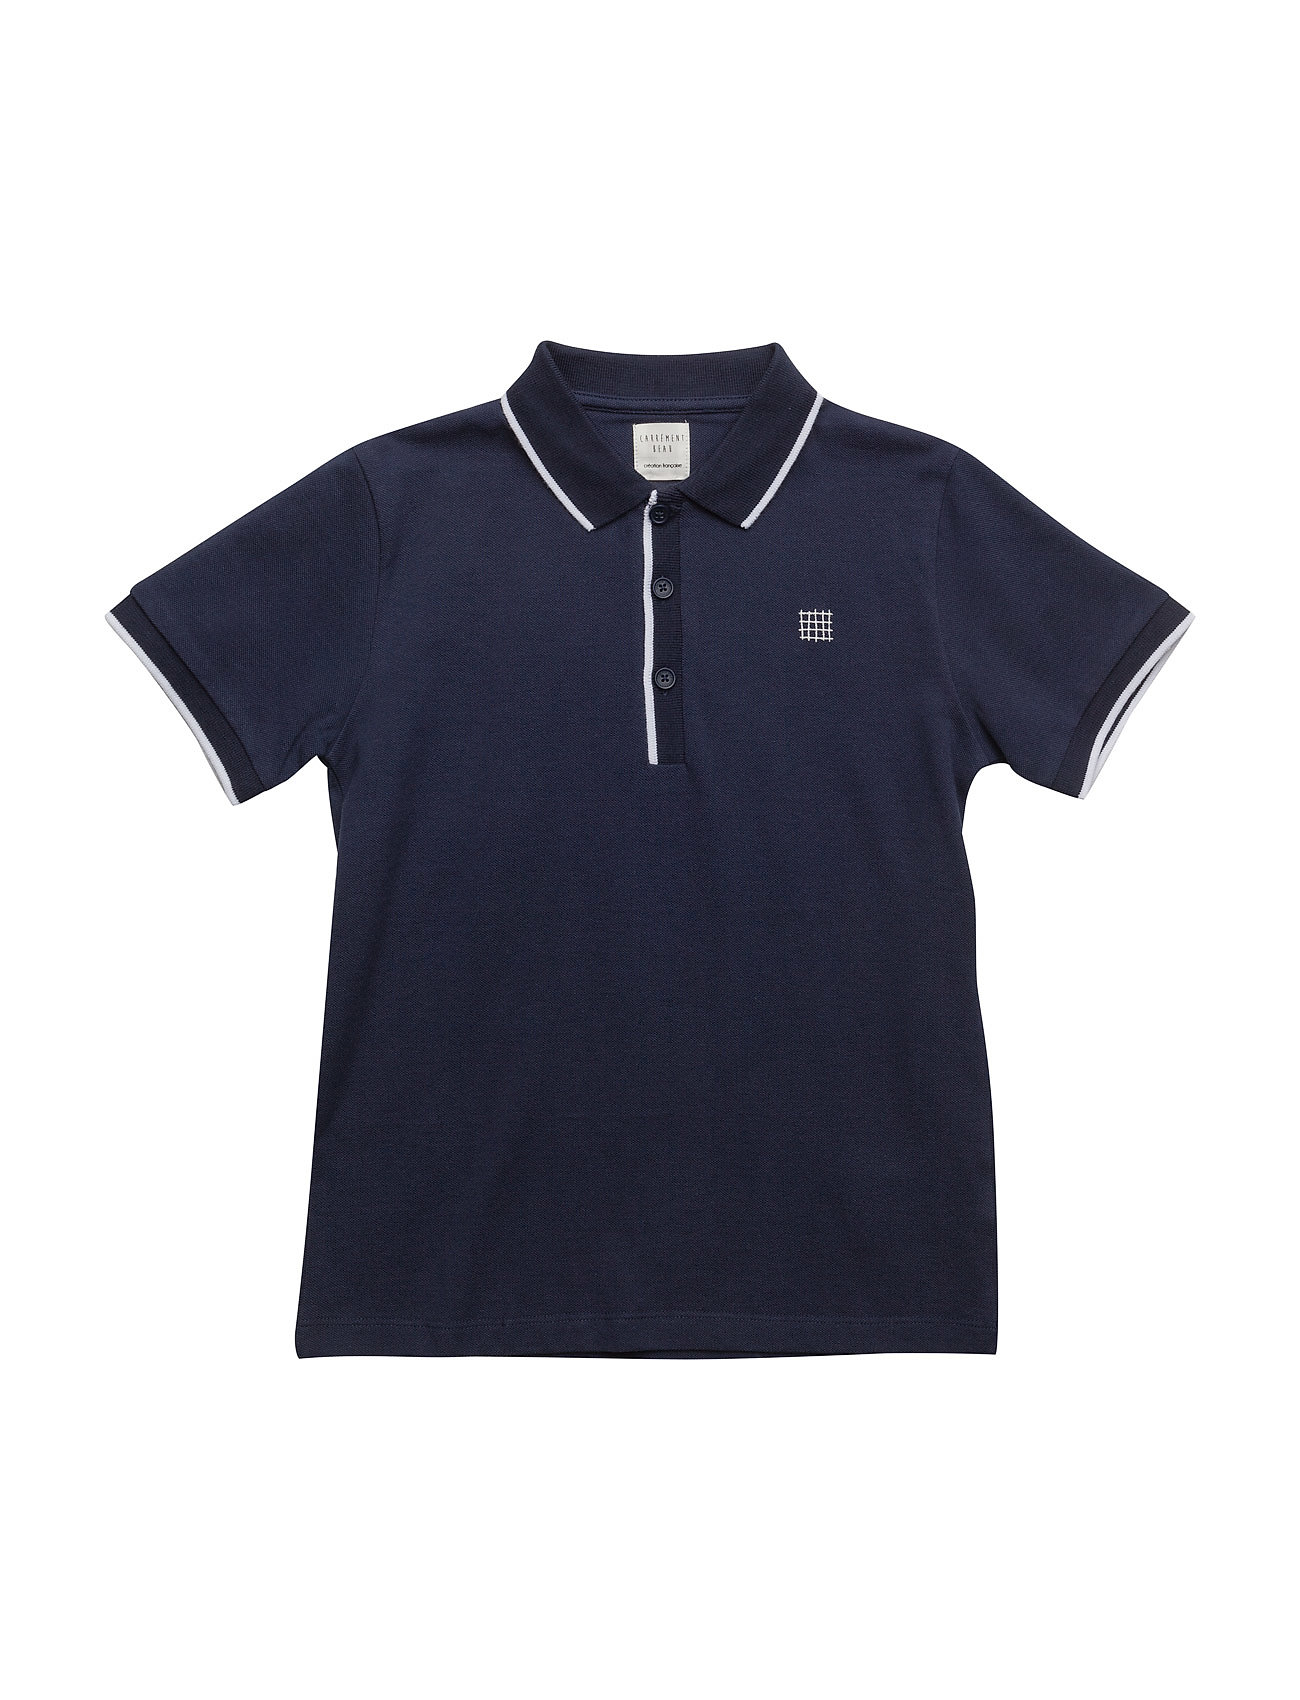 Polo Shirt Carrément Beau Kortærmede t-shirts til Børn i Navy blå